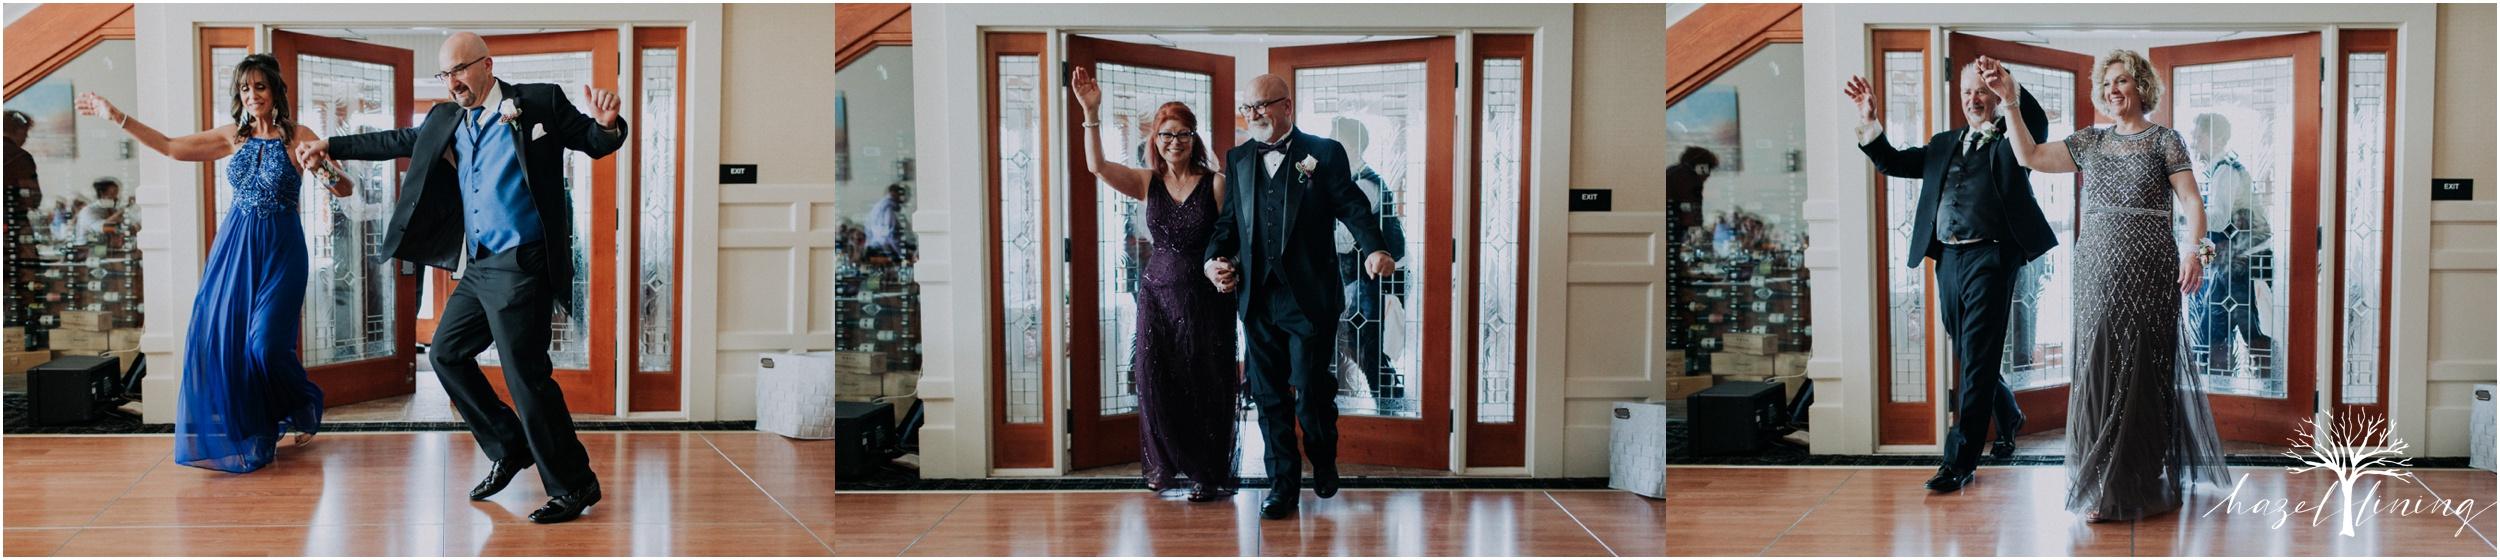 alyssa-james-stiteler-wedding-loft-and-sweet-water-cc-pennsburg-pennsylvania-hazel-lining-travel-wedding-elopement-photography_0116.jpg